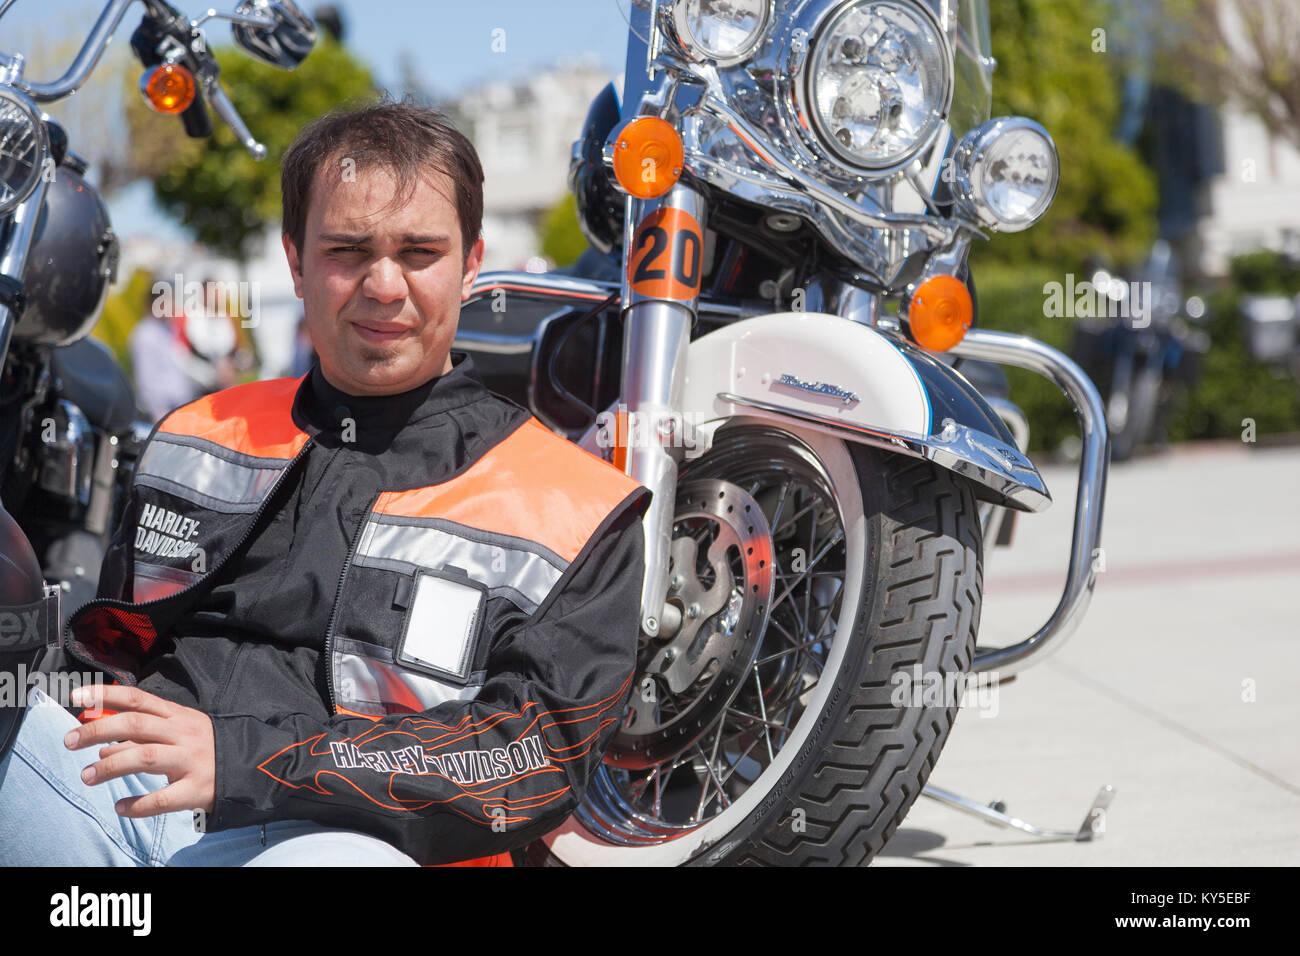 Biker gang stock photos biker gang stock images alamy for A m motors paris ky